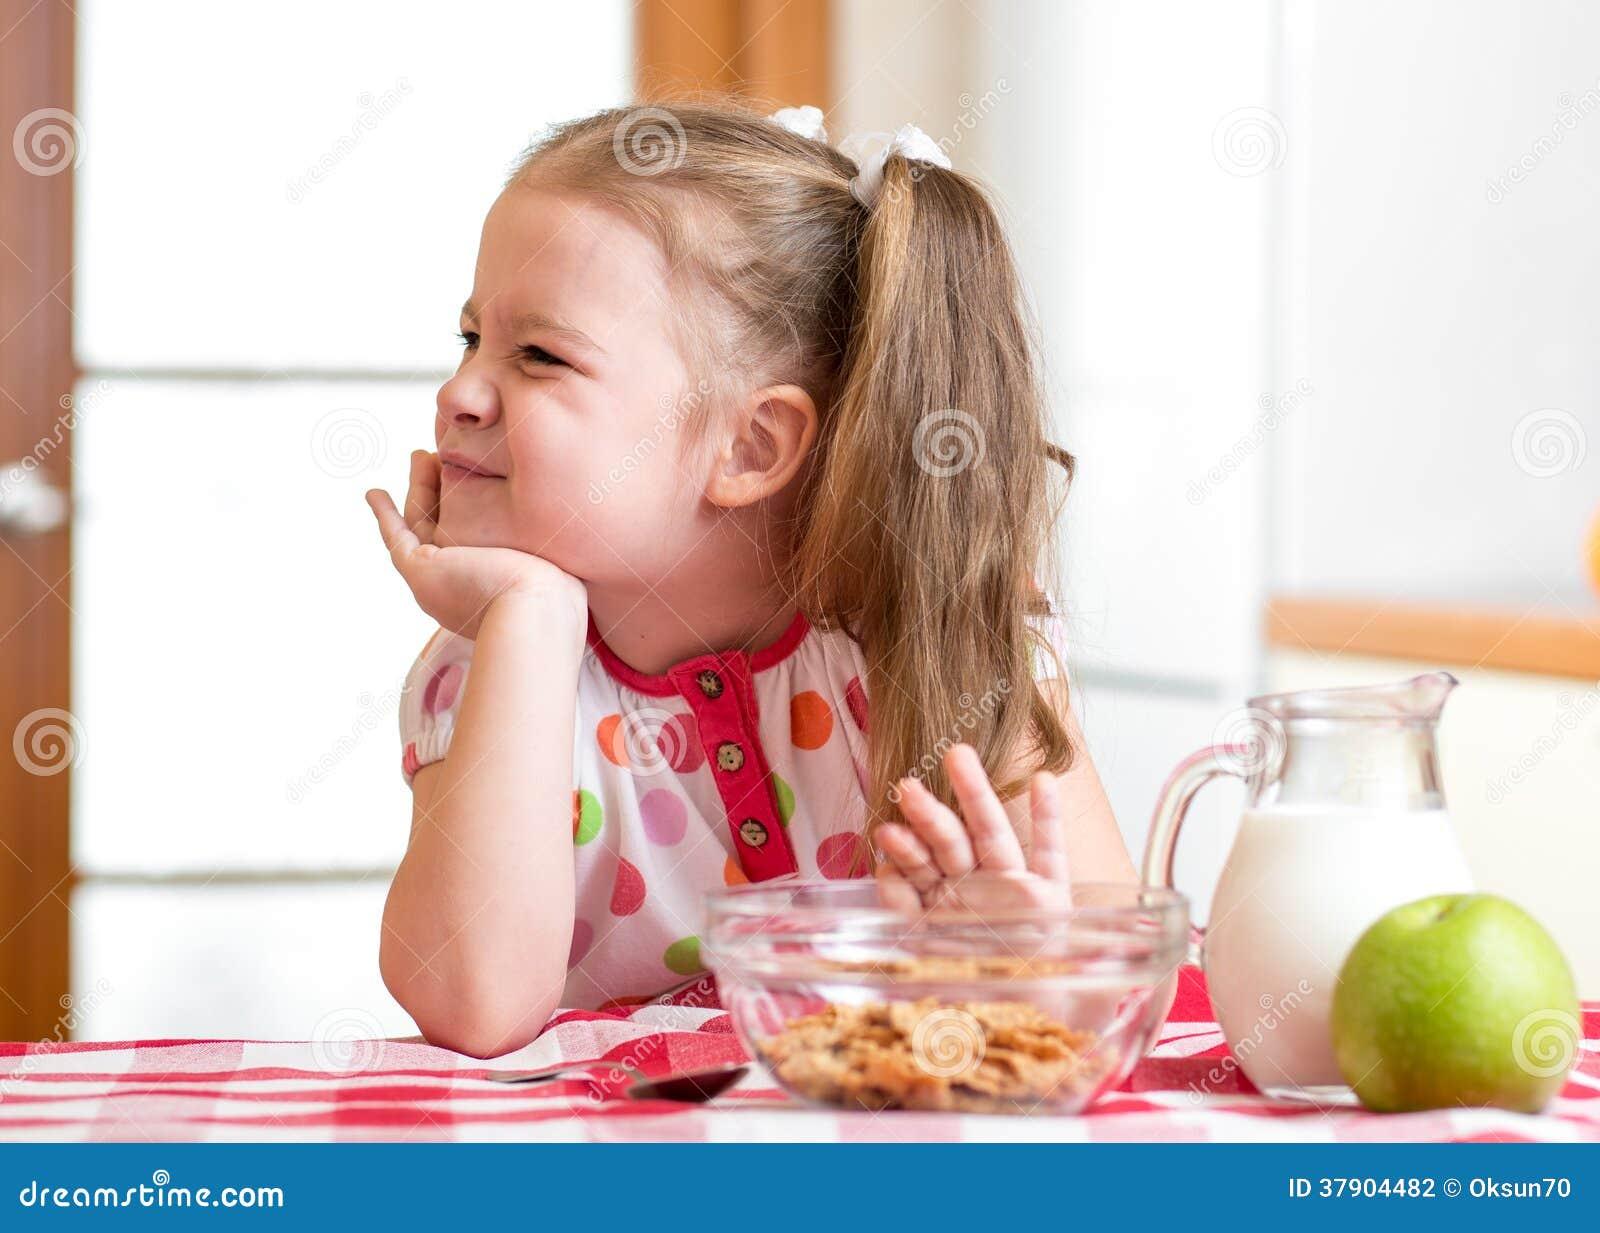 Kid Girl Refuses To Eat Healthy Food Stock Photography   Image